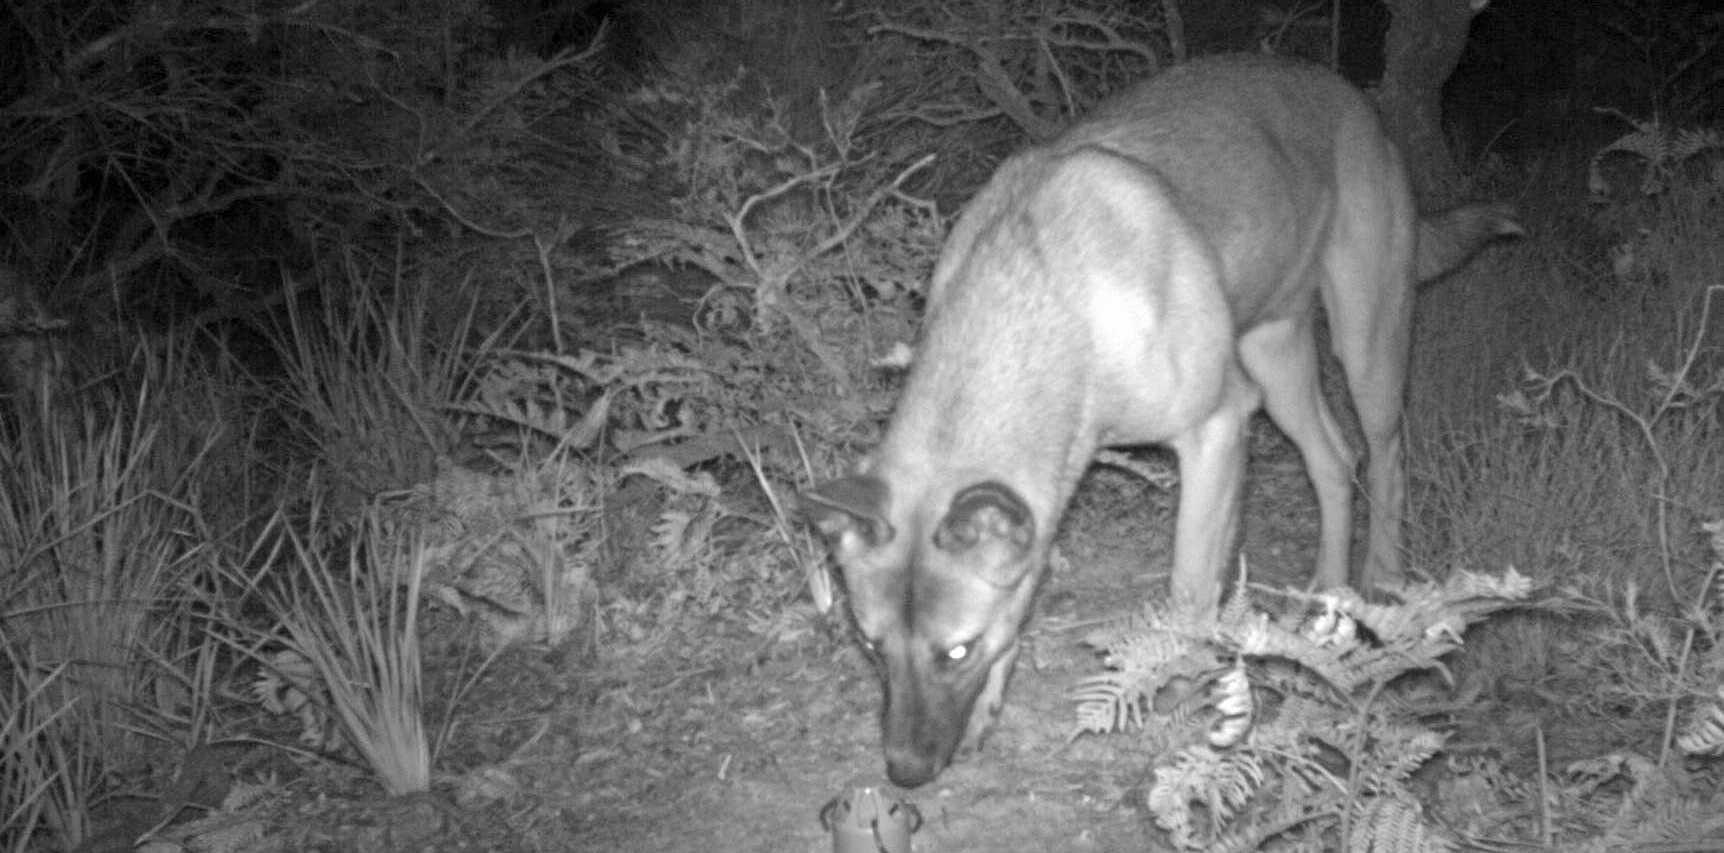 SENSELESS ATTACKS: A Northern Rivers landowner said she has two-thirds of her sheep to senseless wild dog attacks.